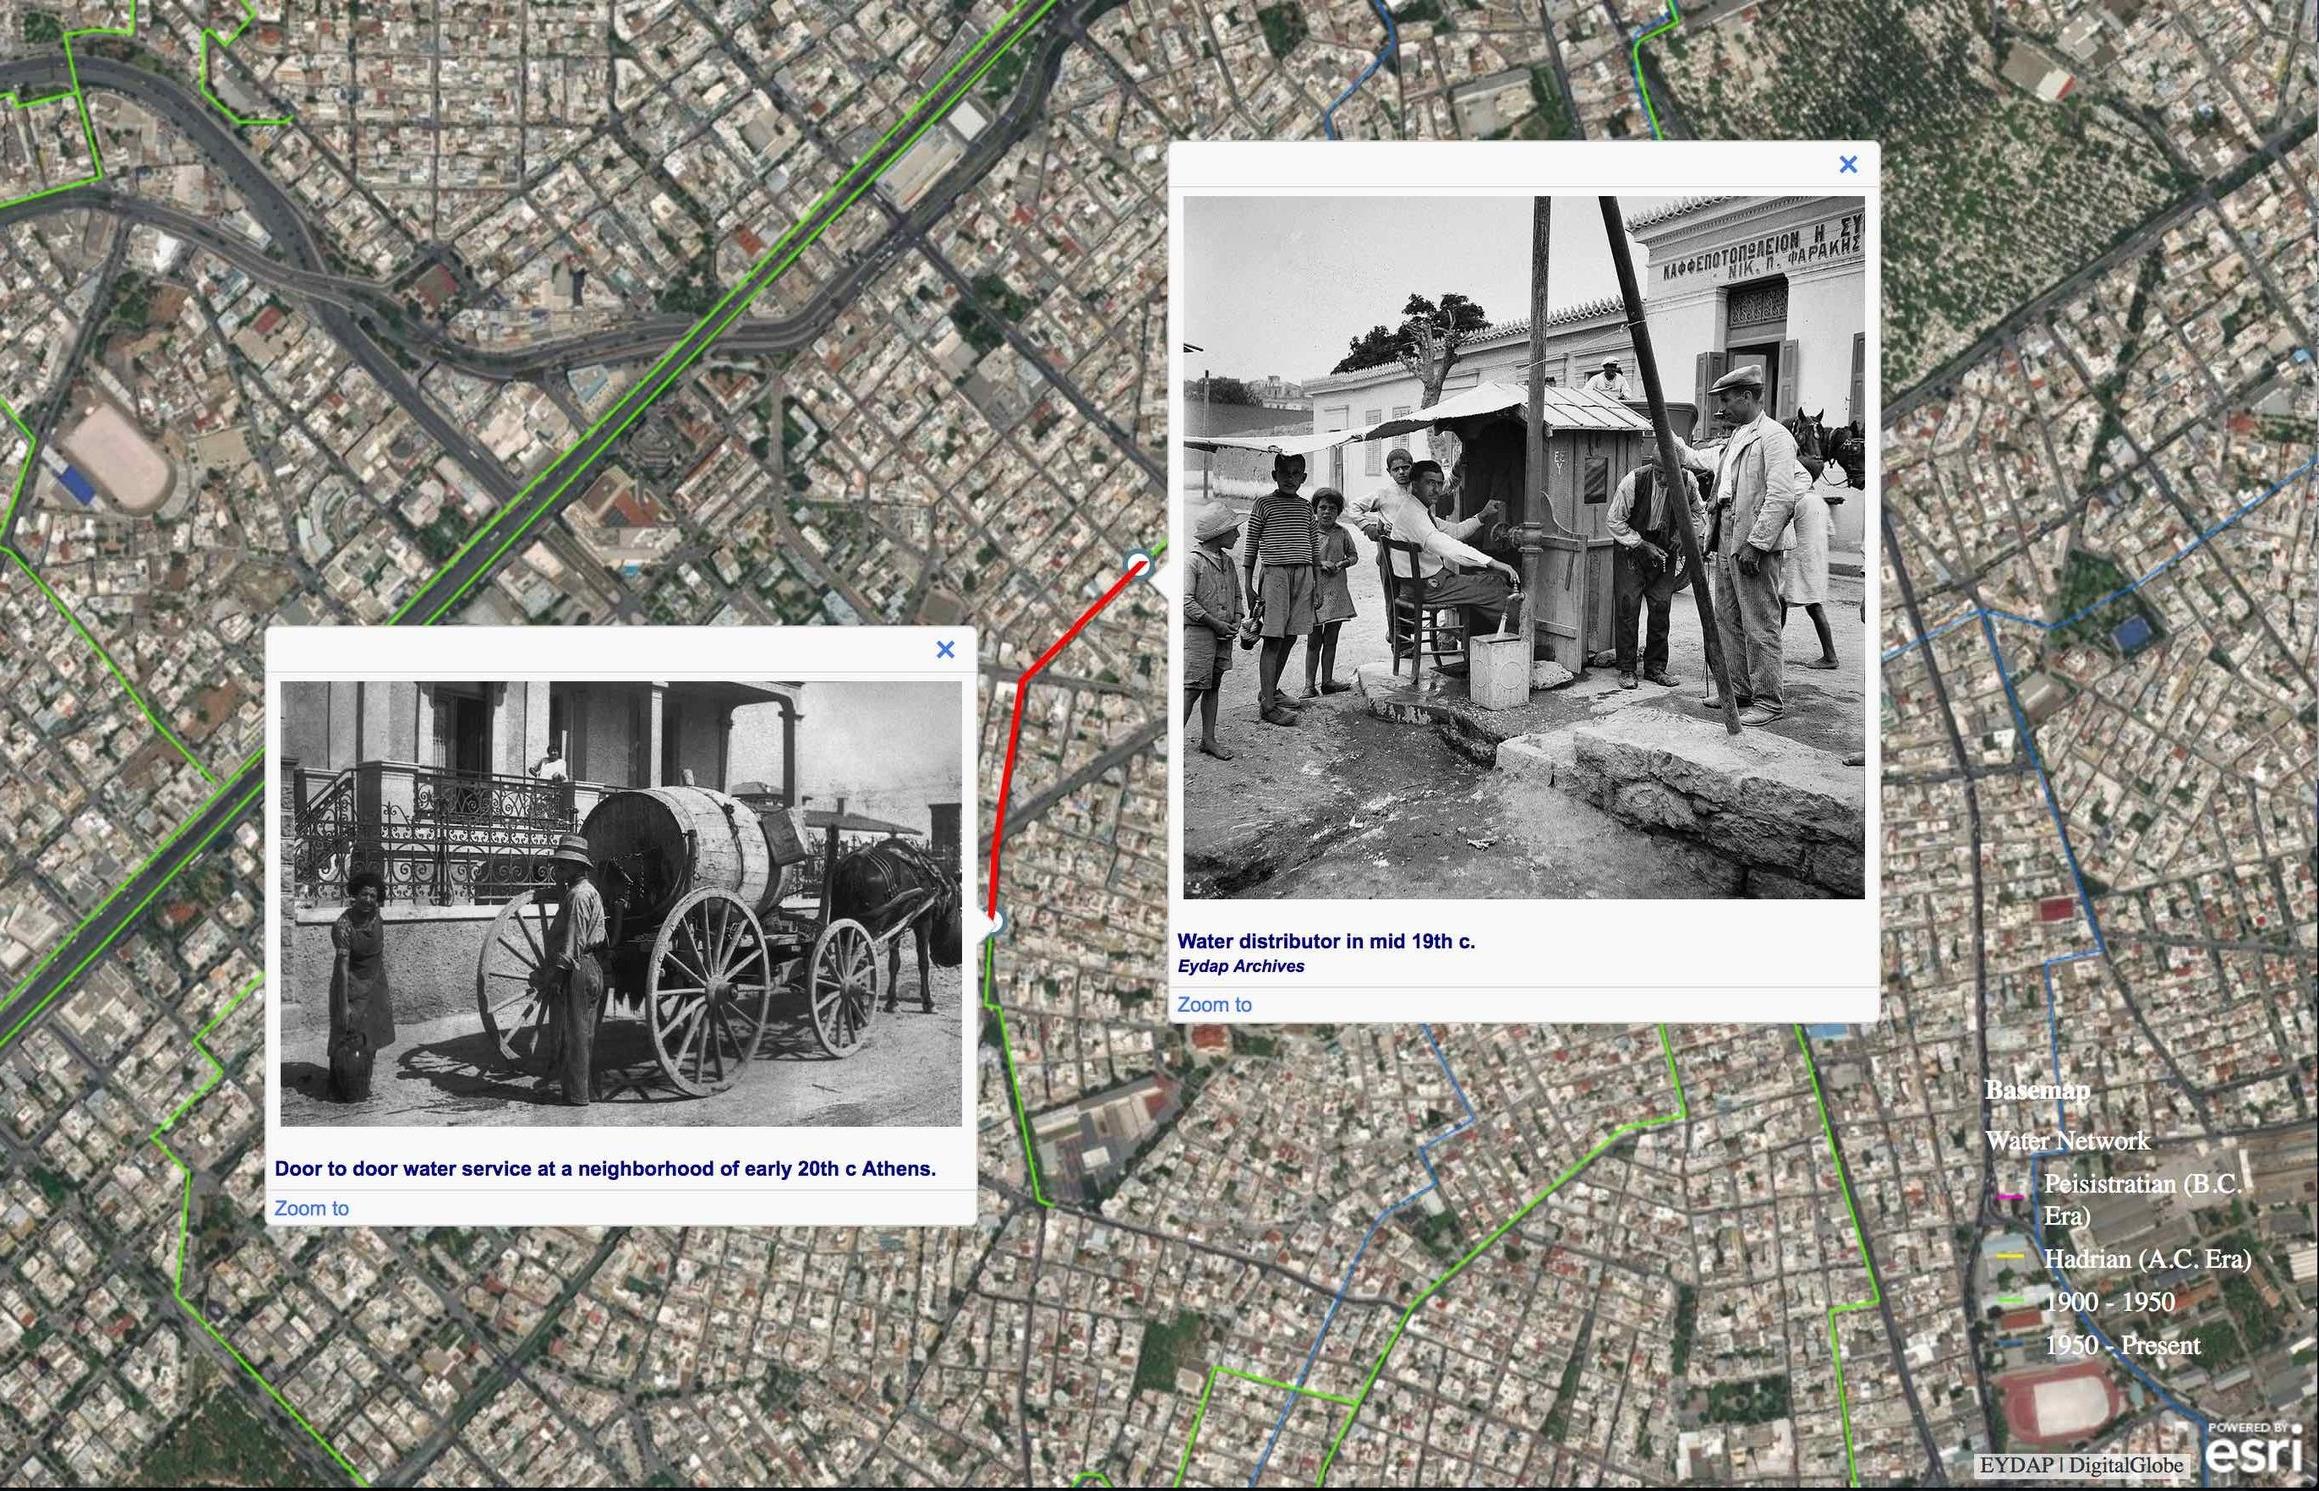 9 SeoulBiennale:Athens:EYDAP APP.jpg